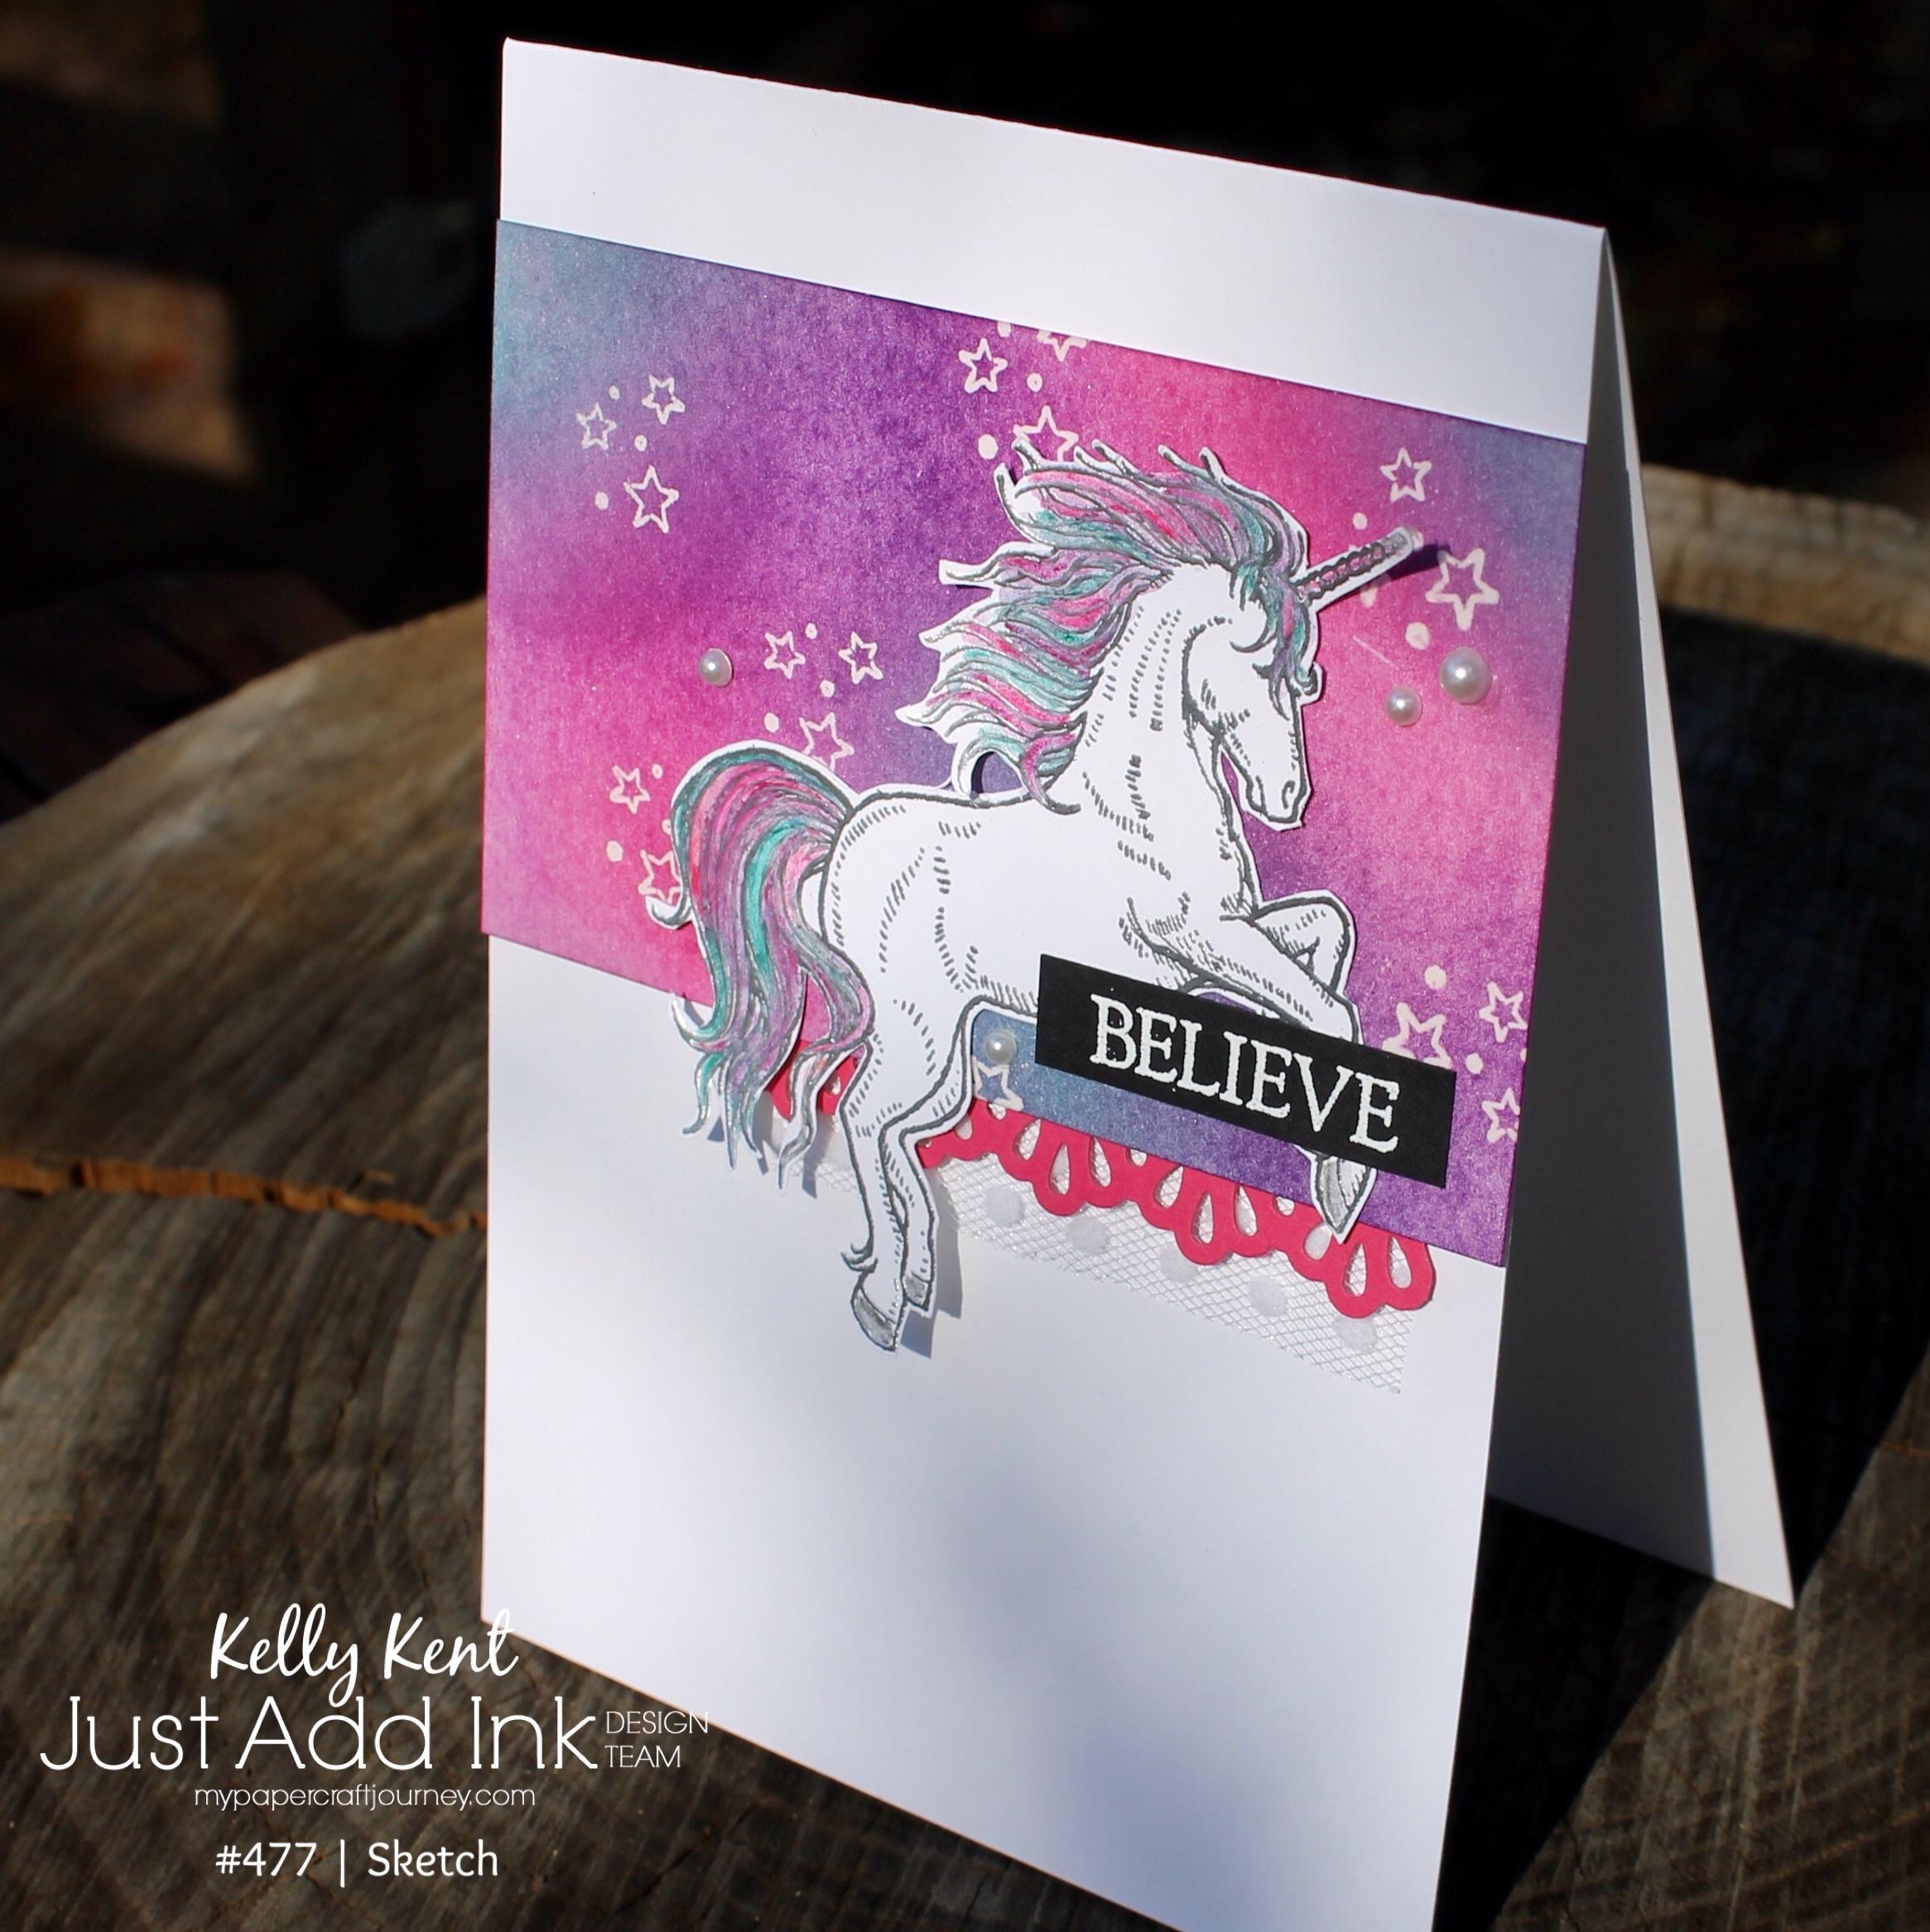 Leave a Little Sparkle | kelly kent